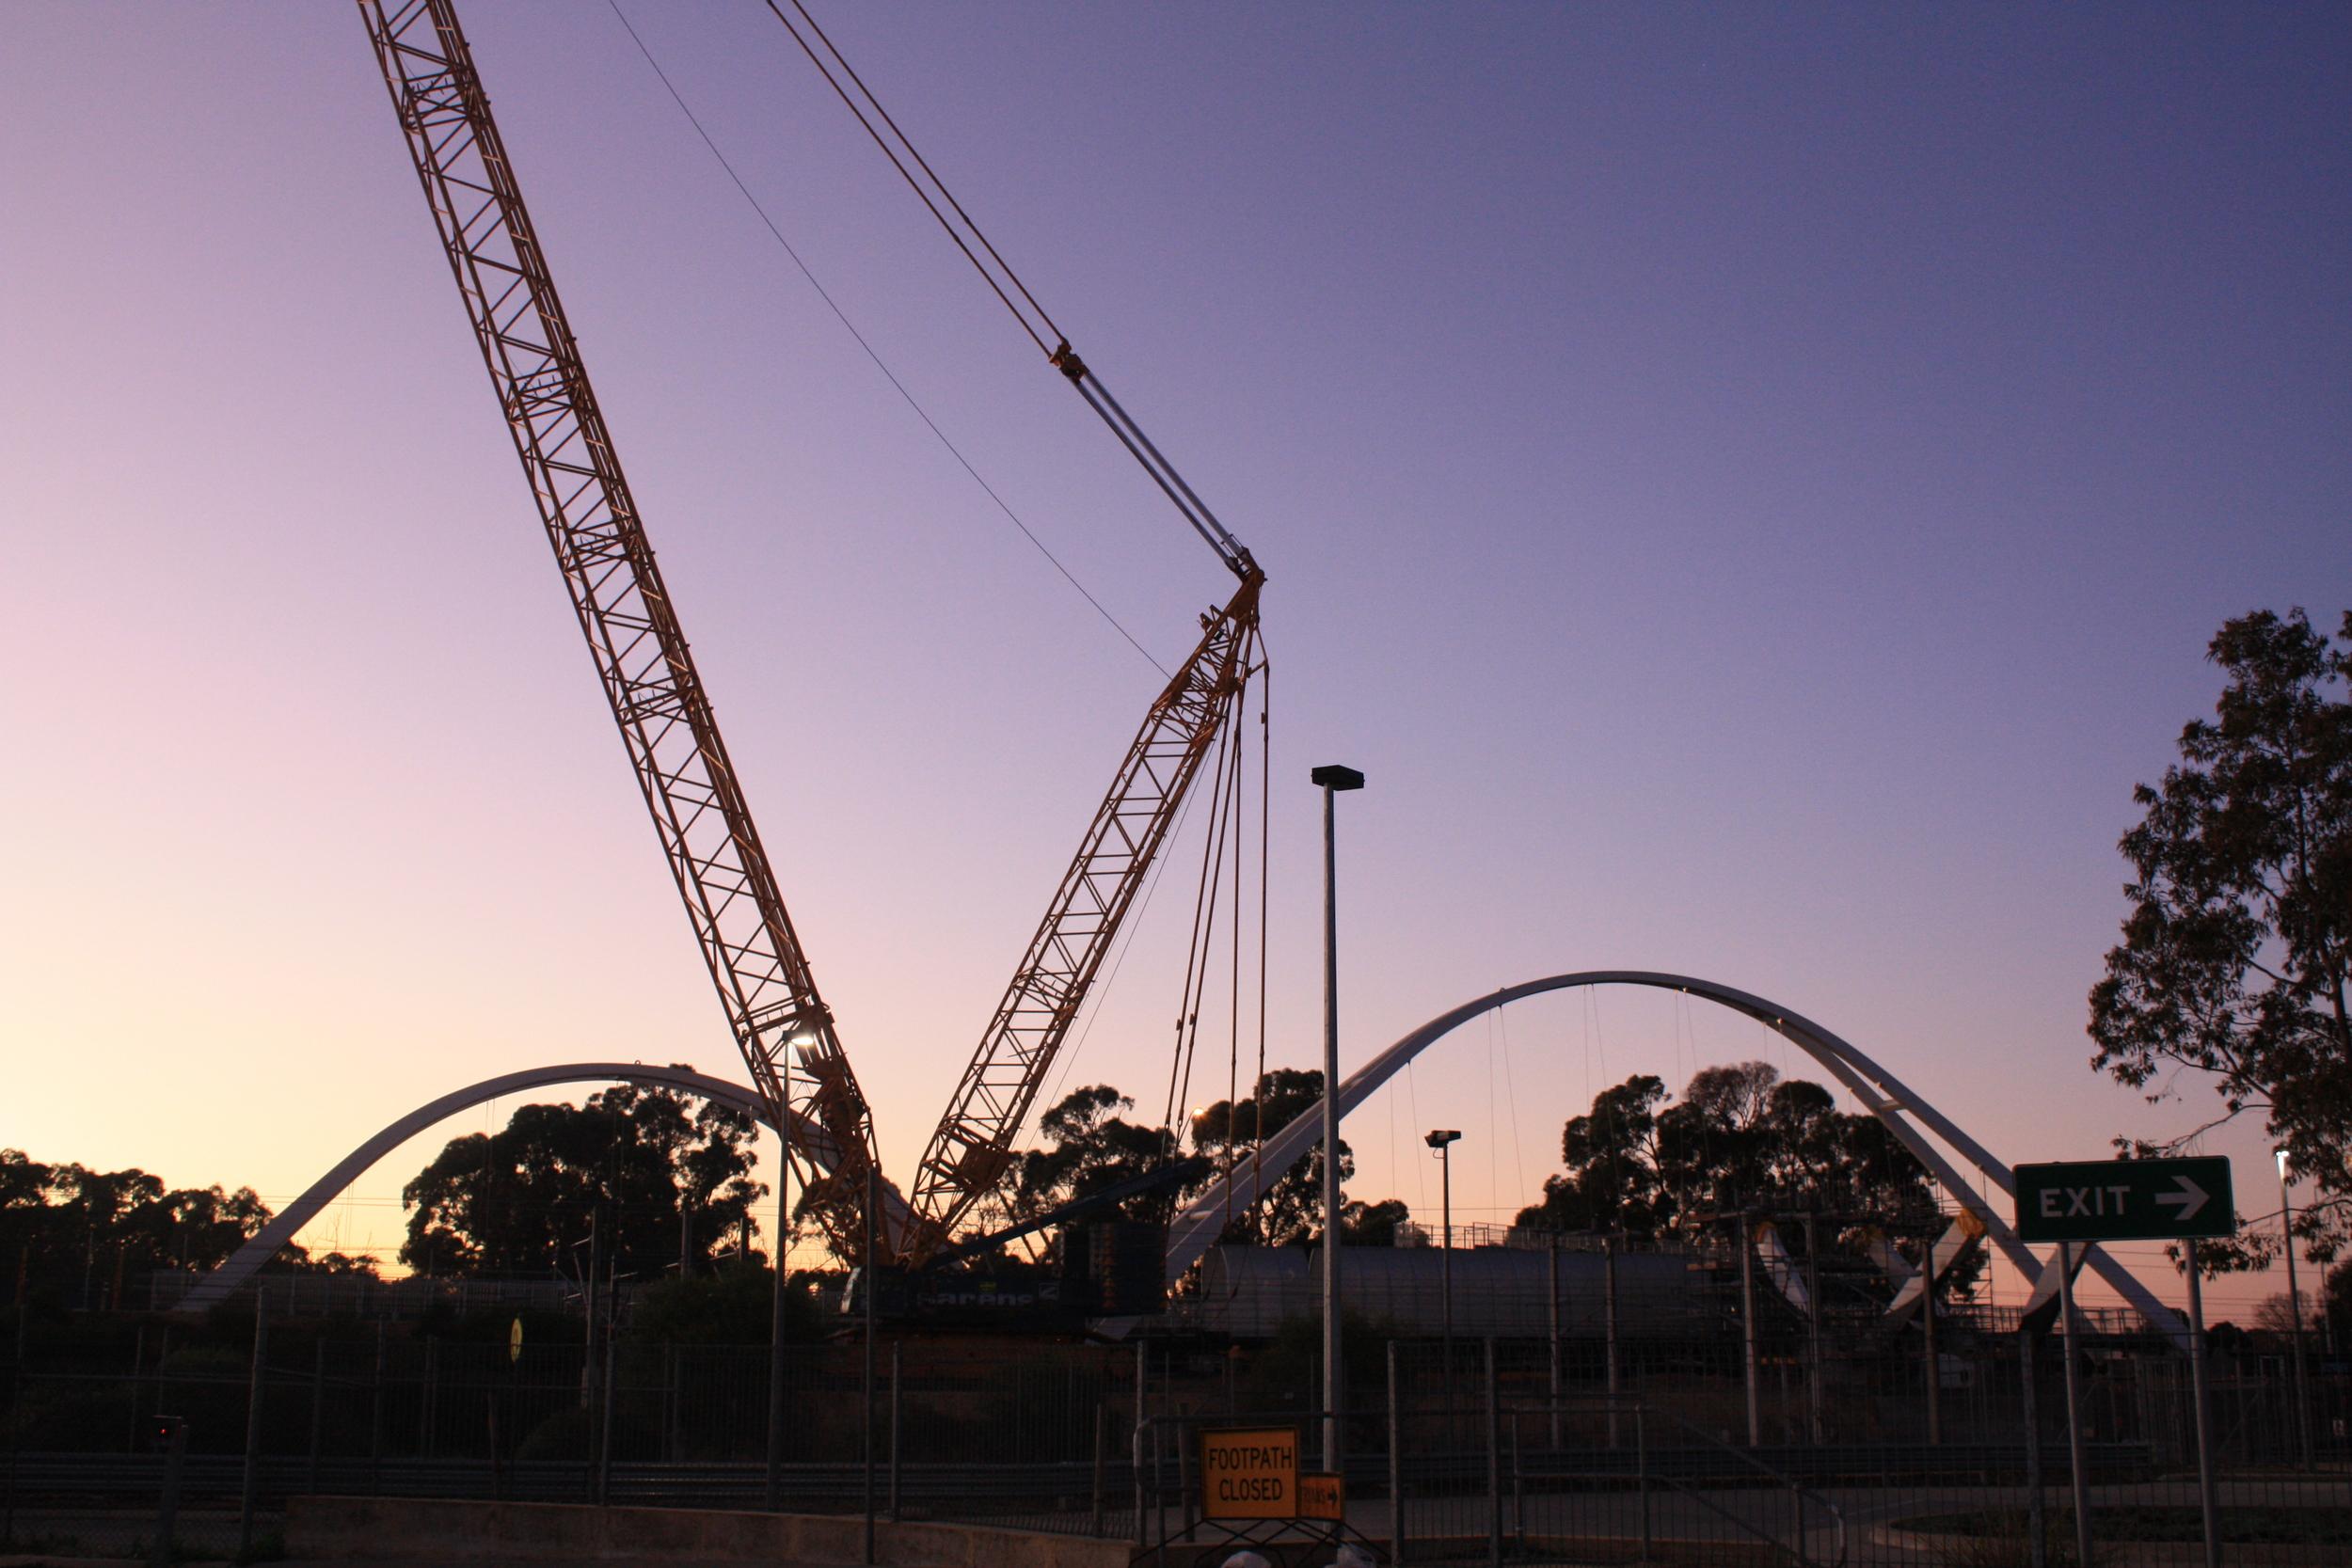 The Mandurah Road Pedestrian Bridge under construction